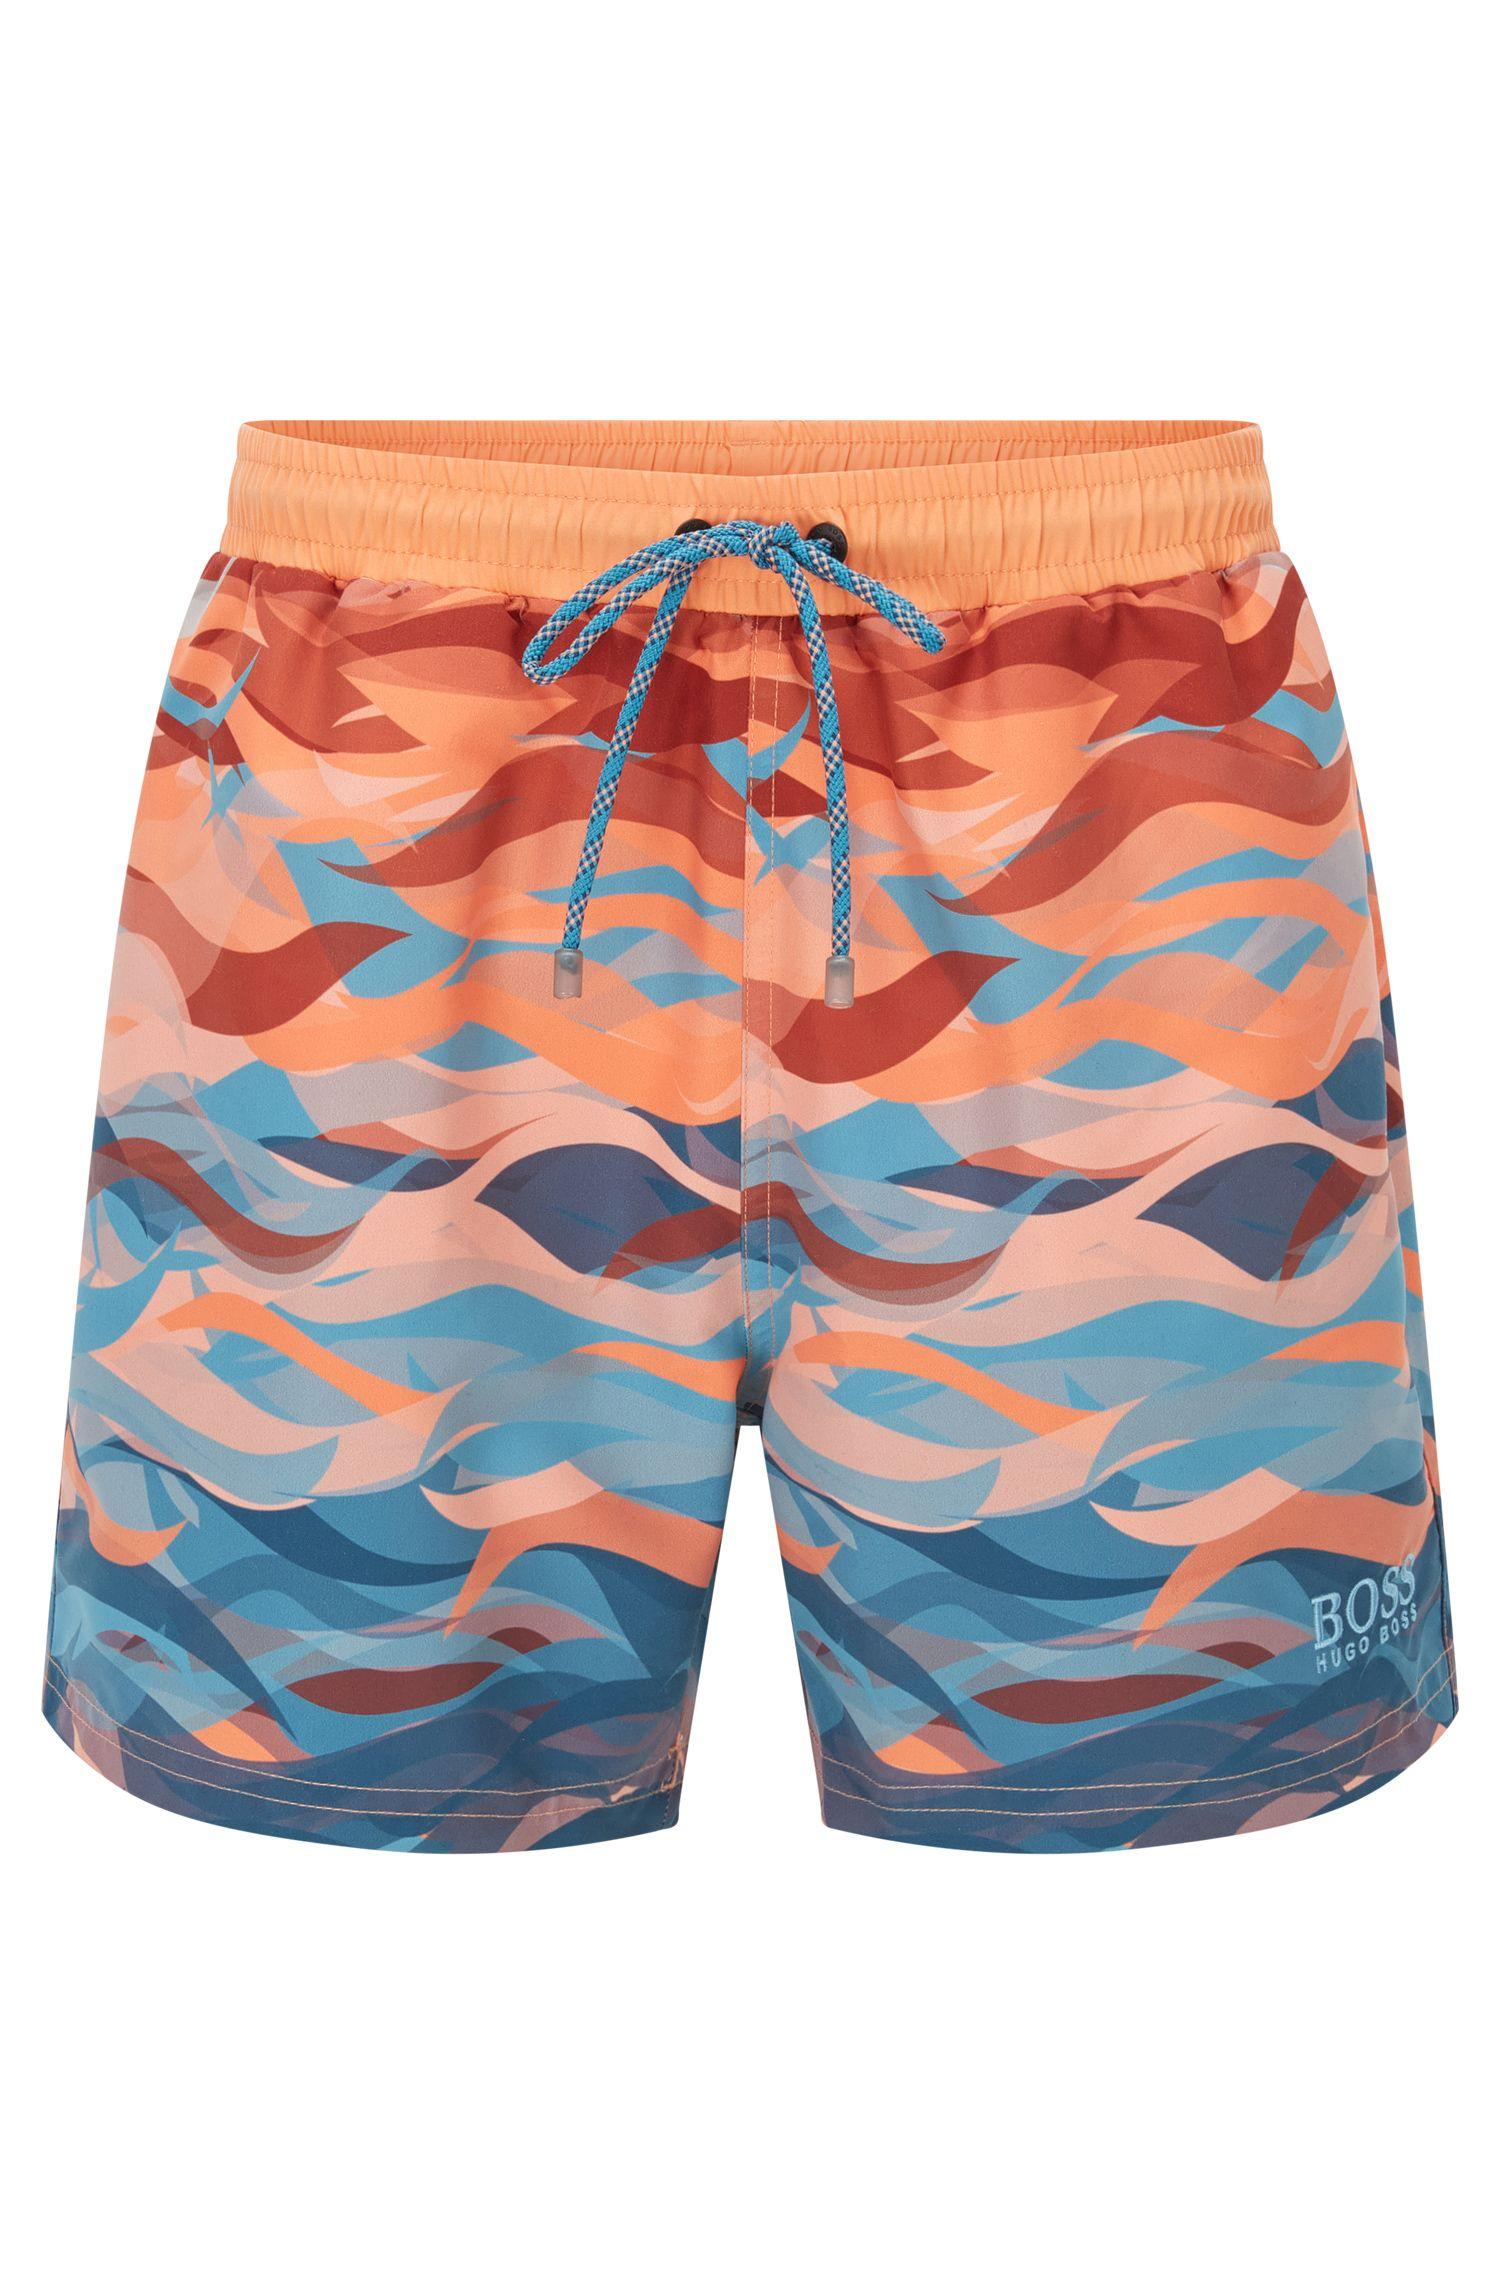 Quick Dry Swim Trunk | Piranha, Open Blue